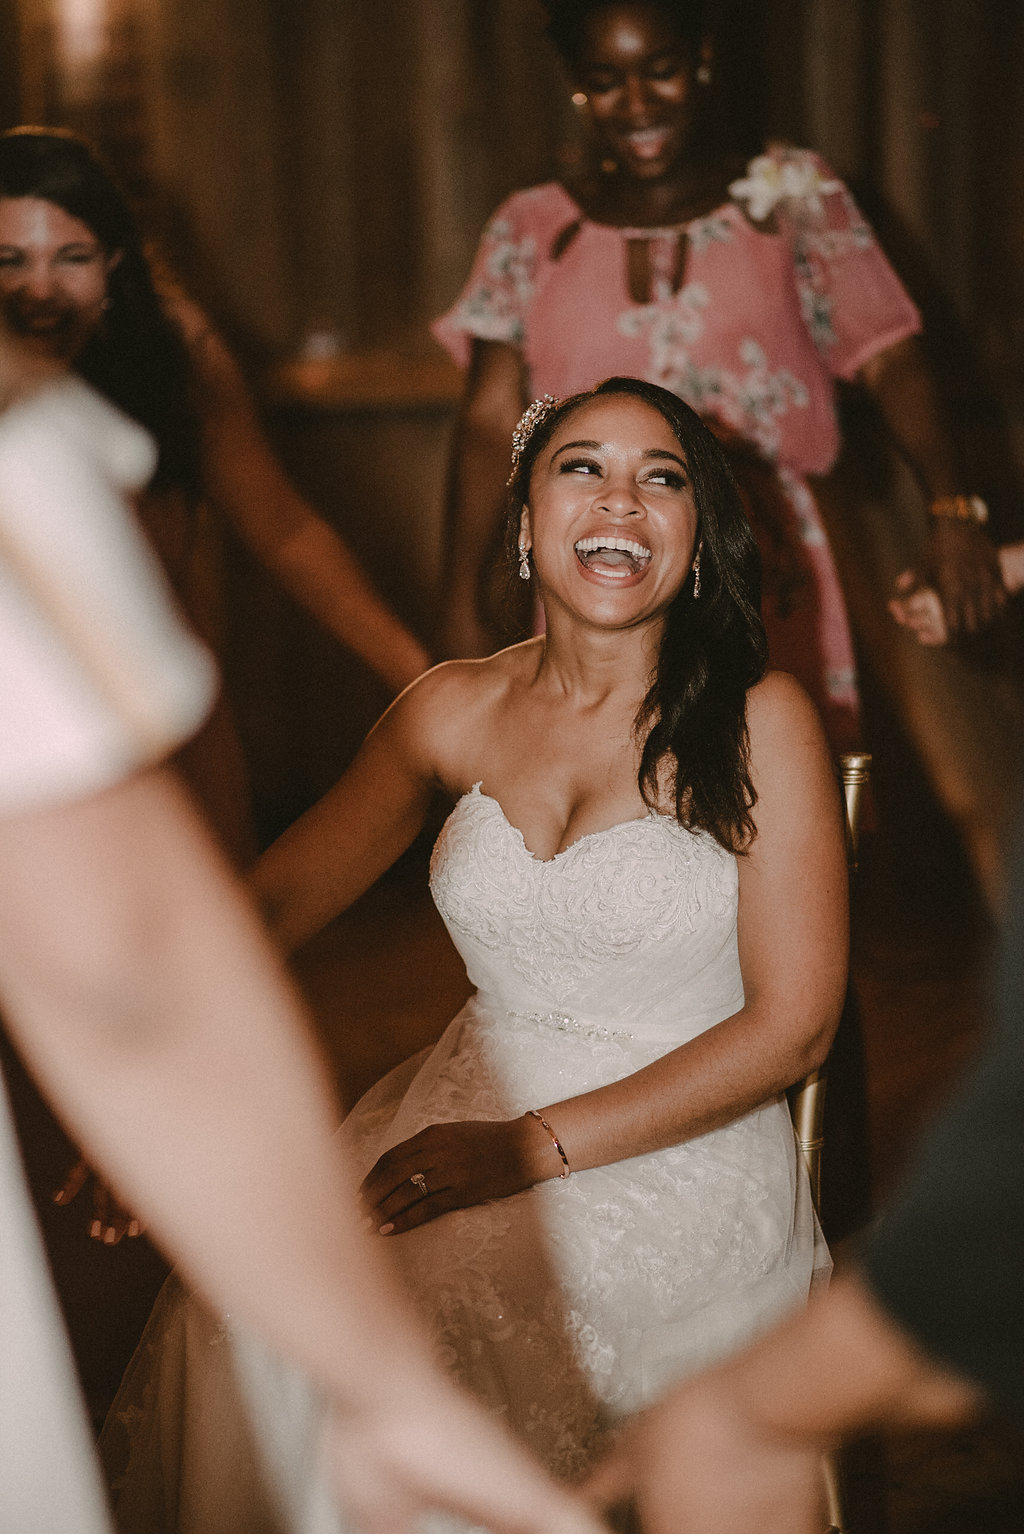 Bride laughing at wedding reception